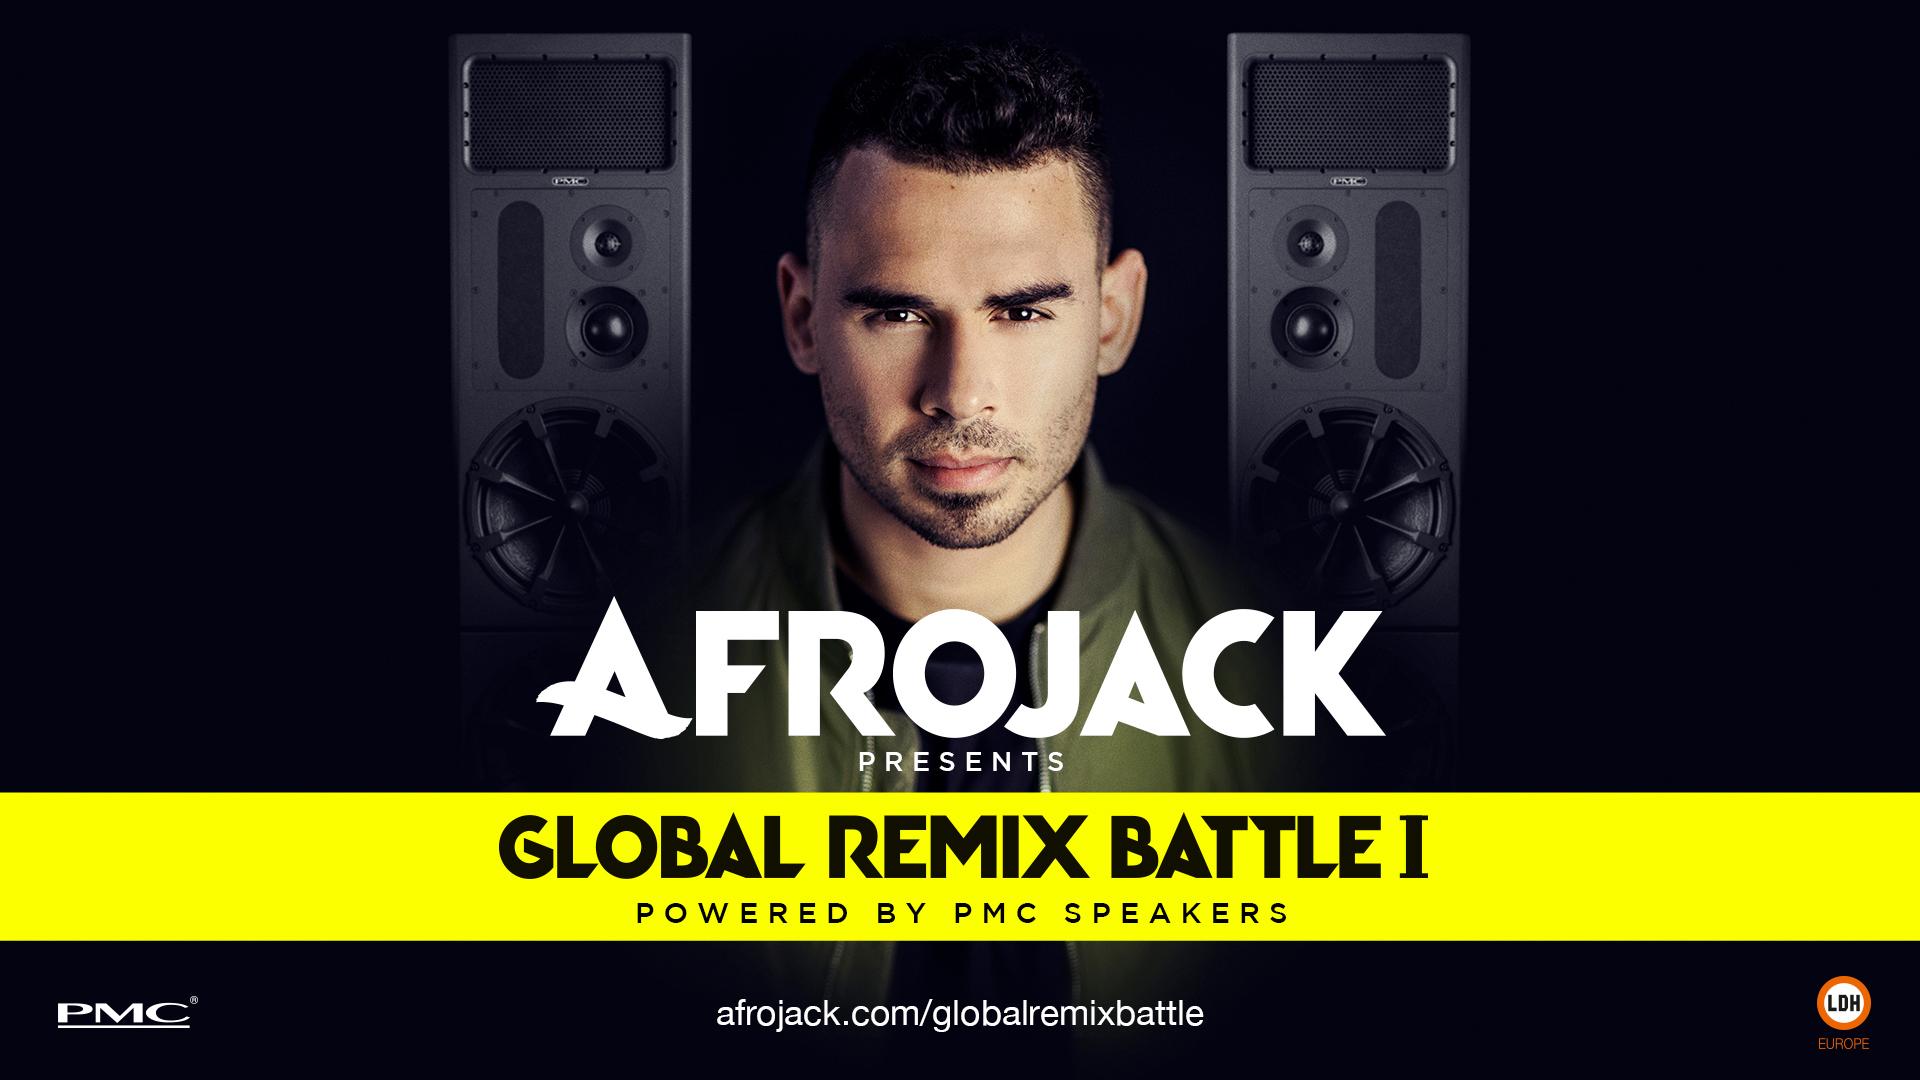 Afrojack Global Remix Battle I